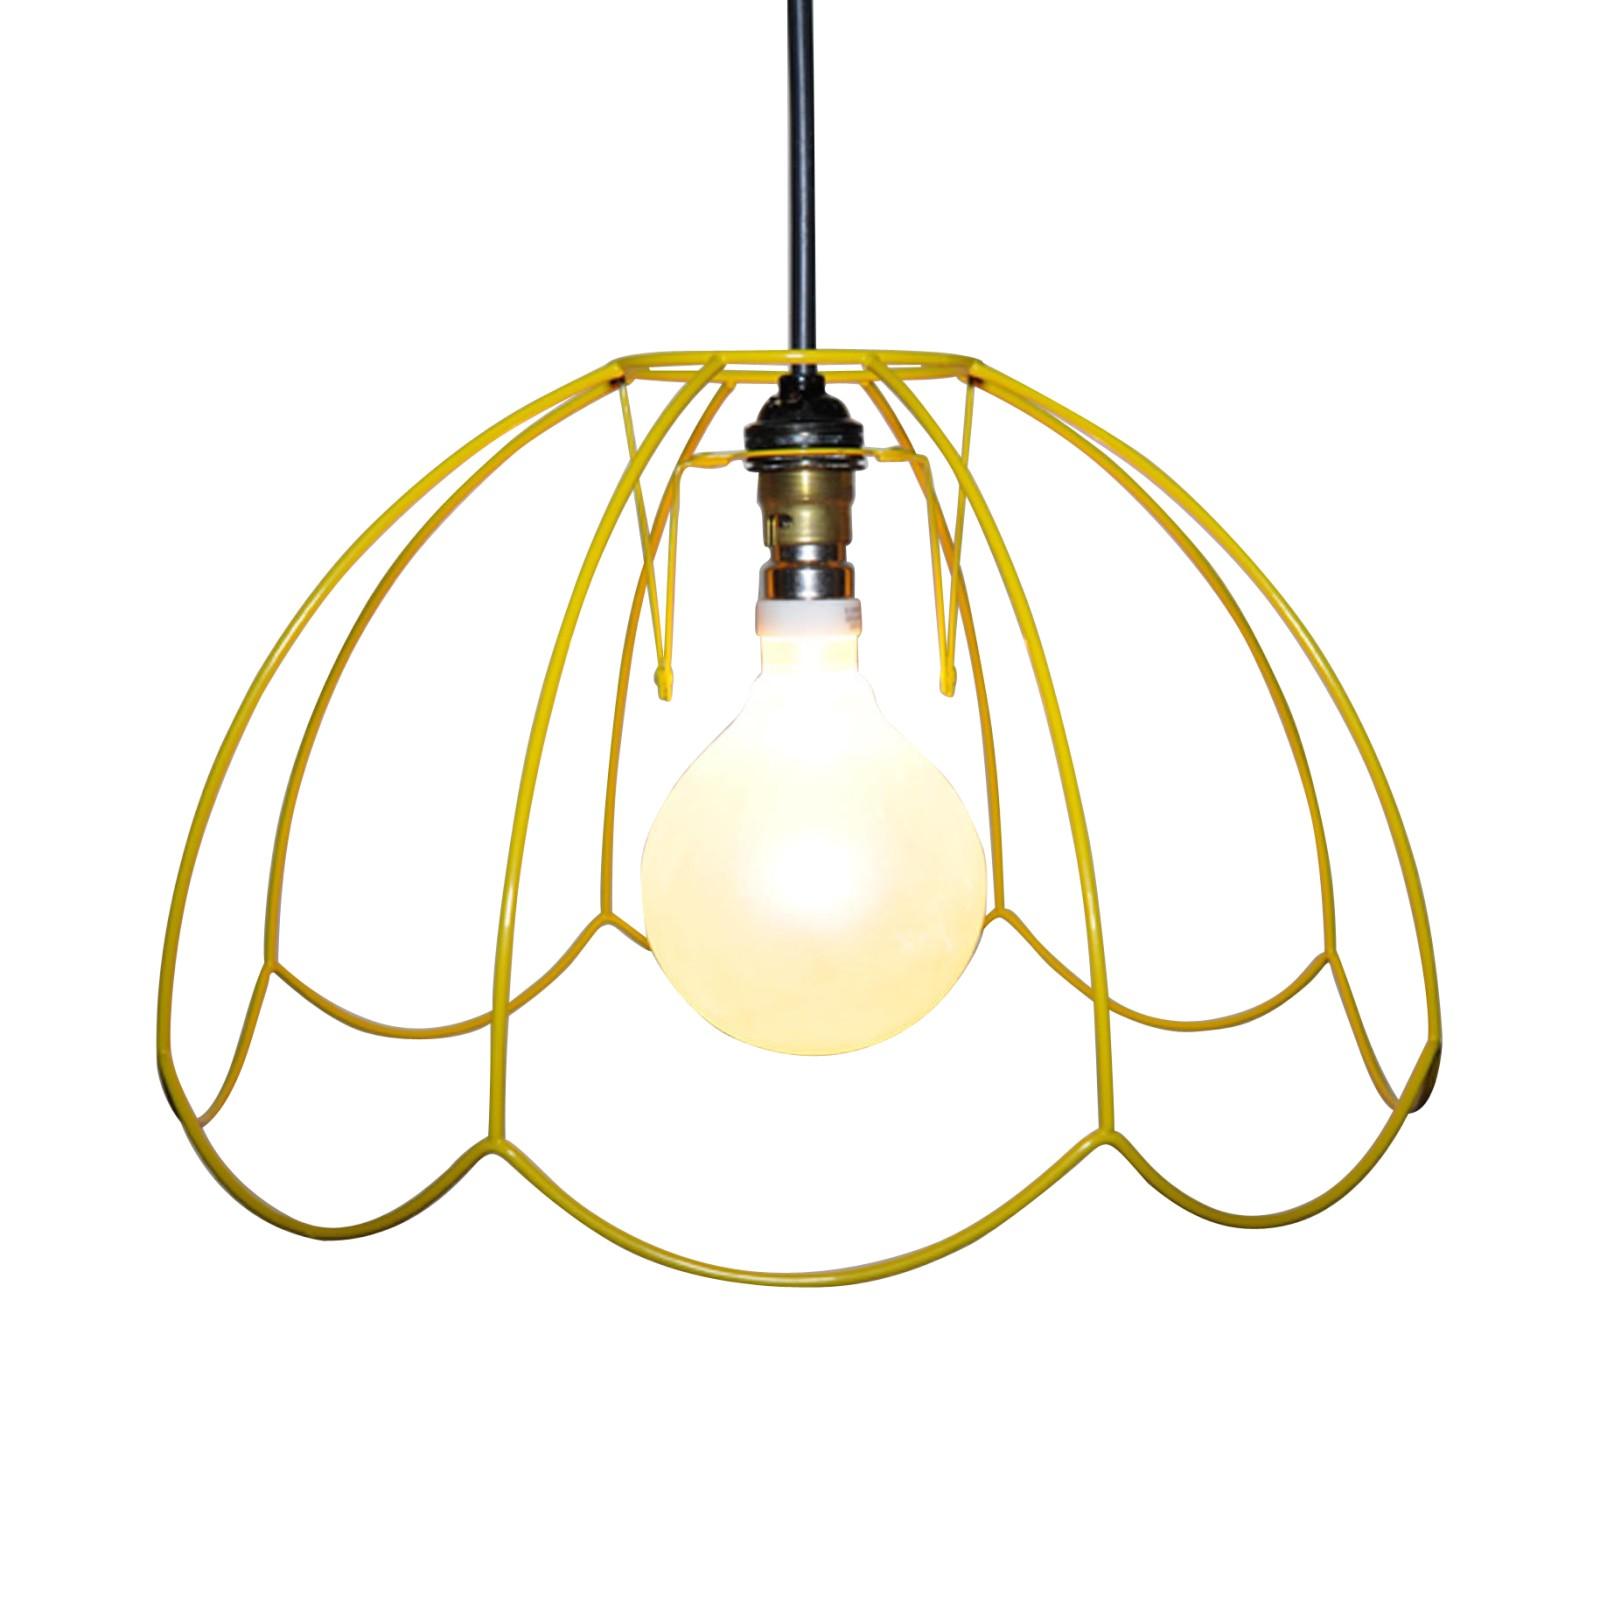 "Tiffany Skeleton Lampshade 14"", Yellow"